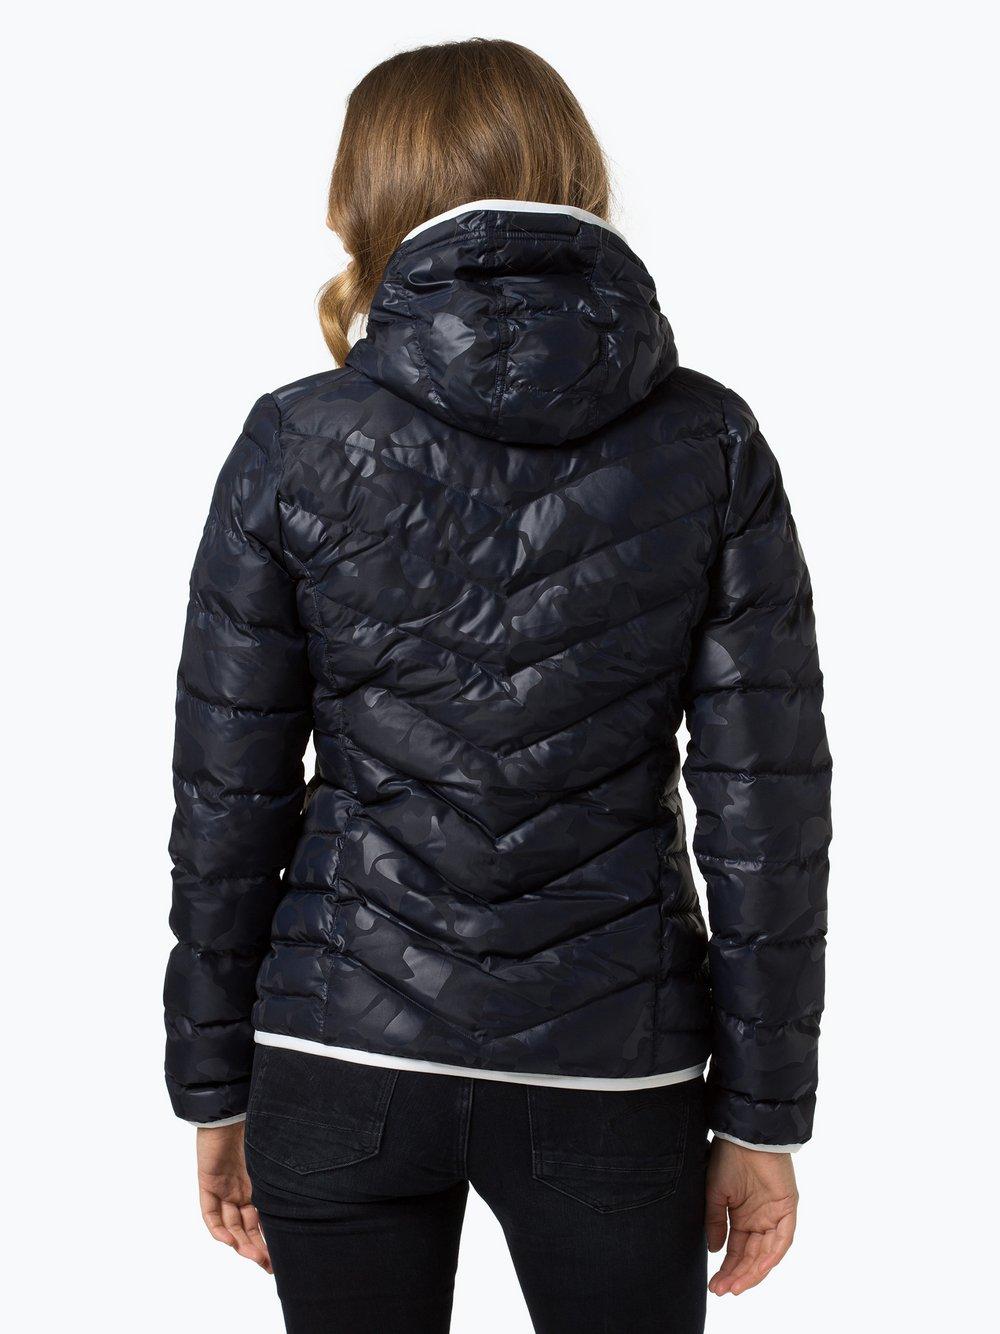 adidas Originals Damska kurtka pikowana kup online